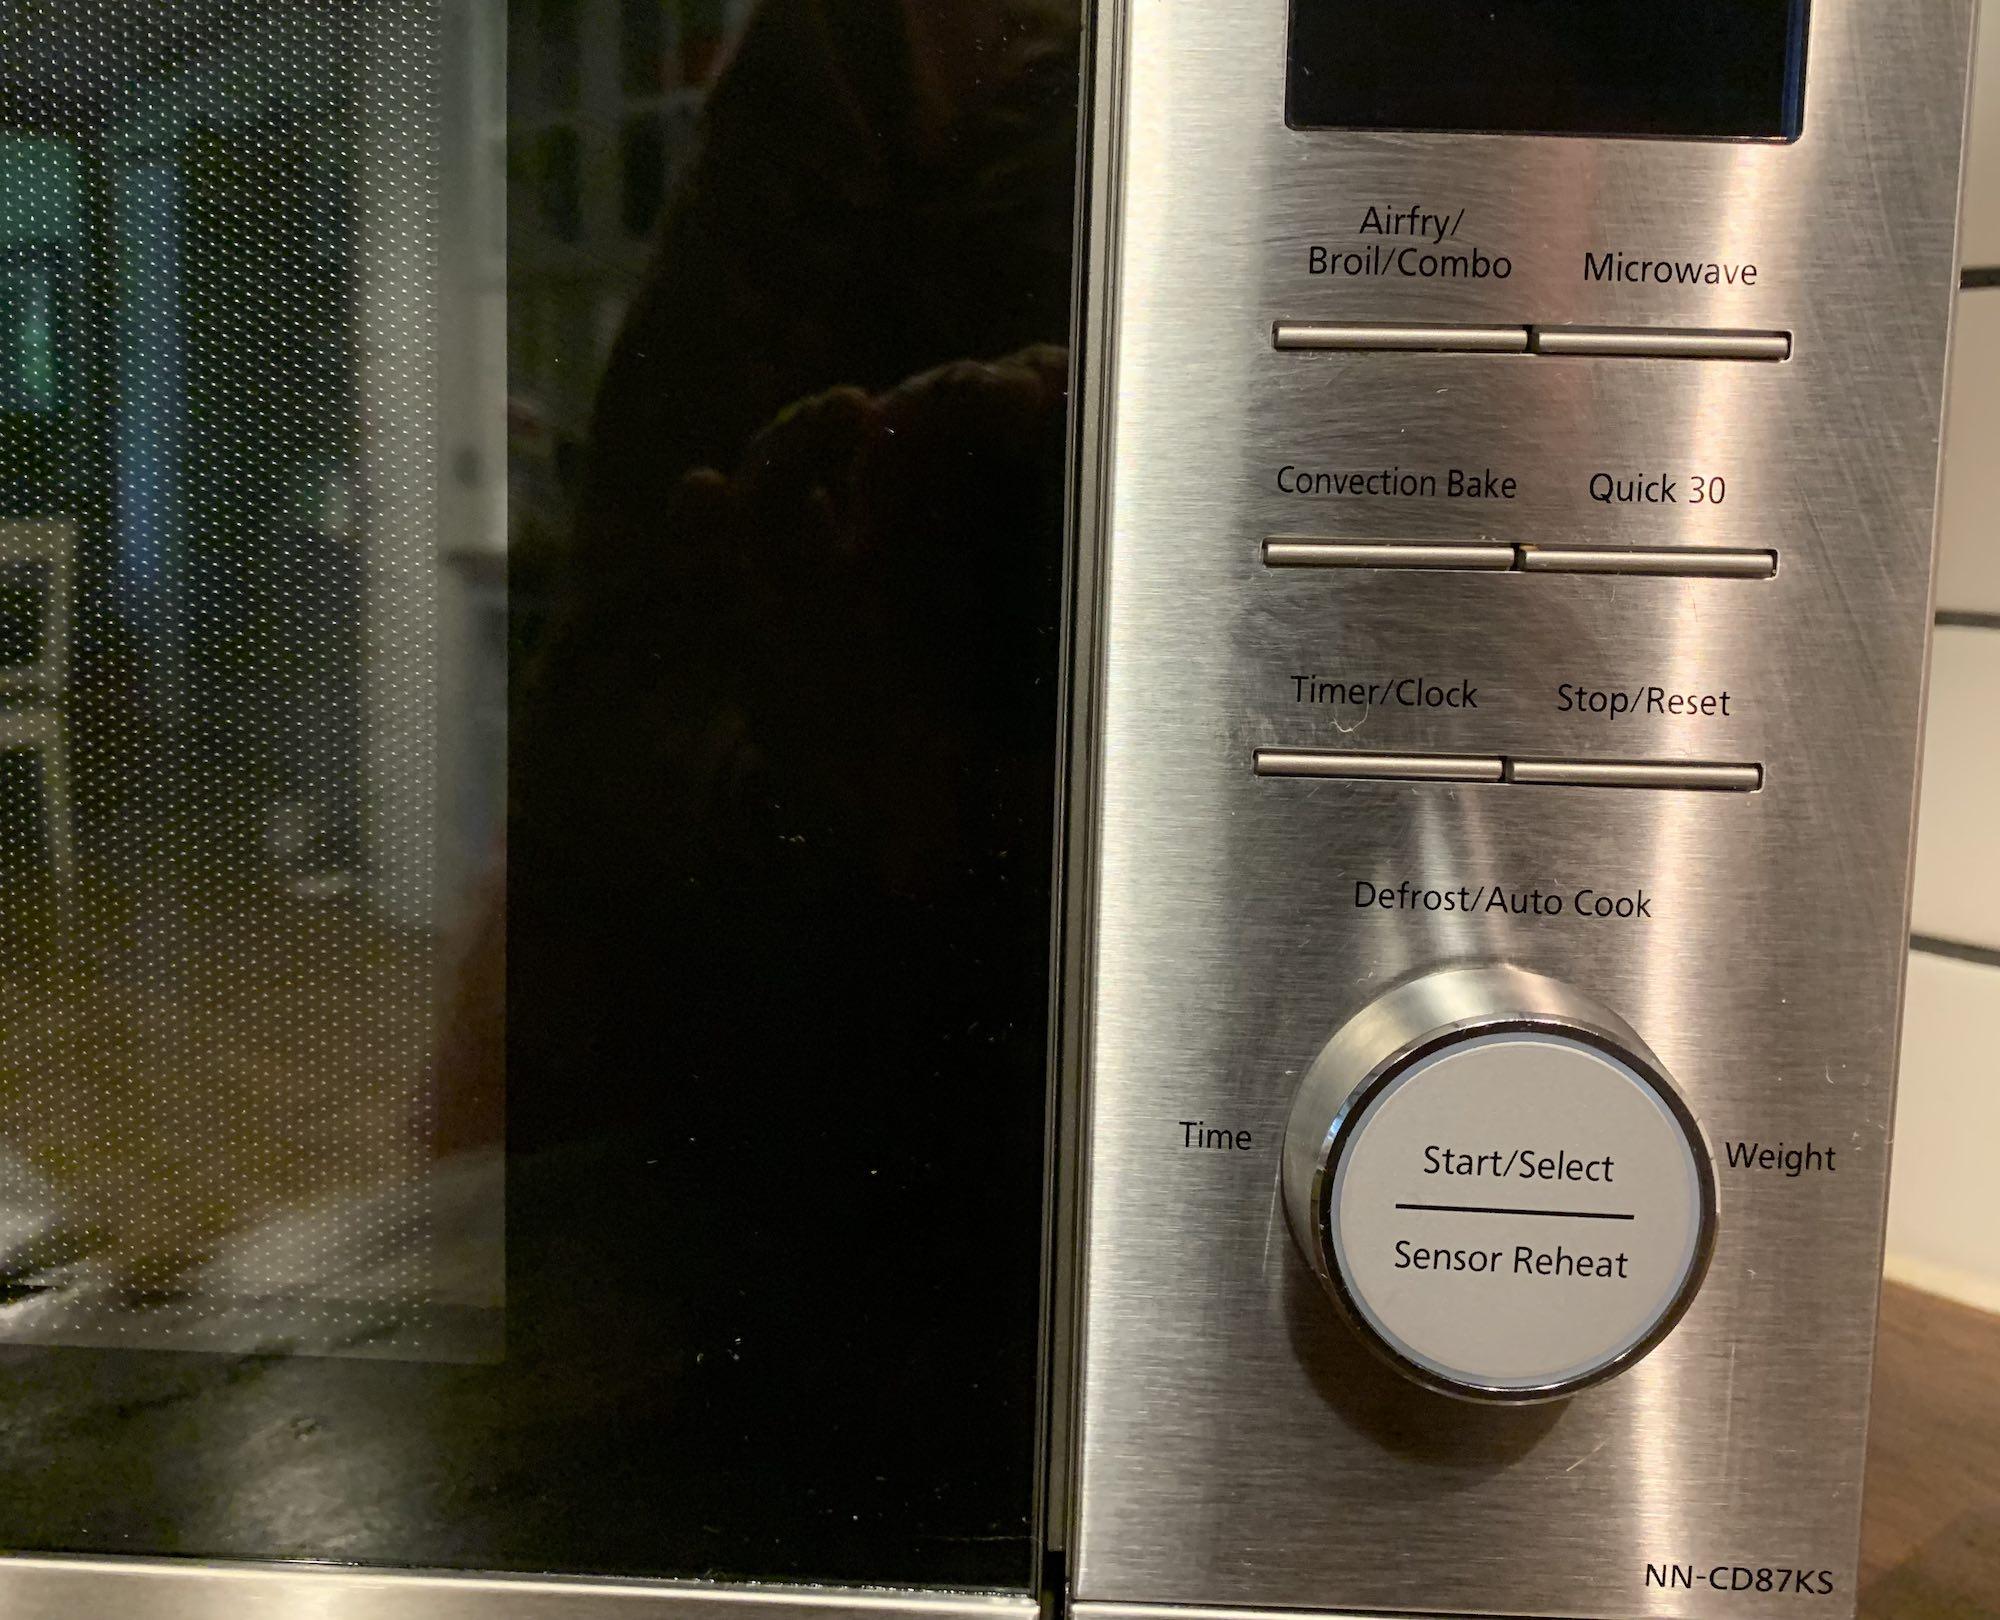 Panasonic Genius 4-in-1 microwave